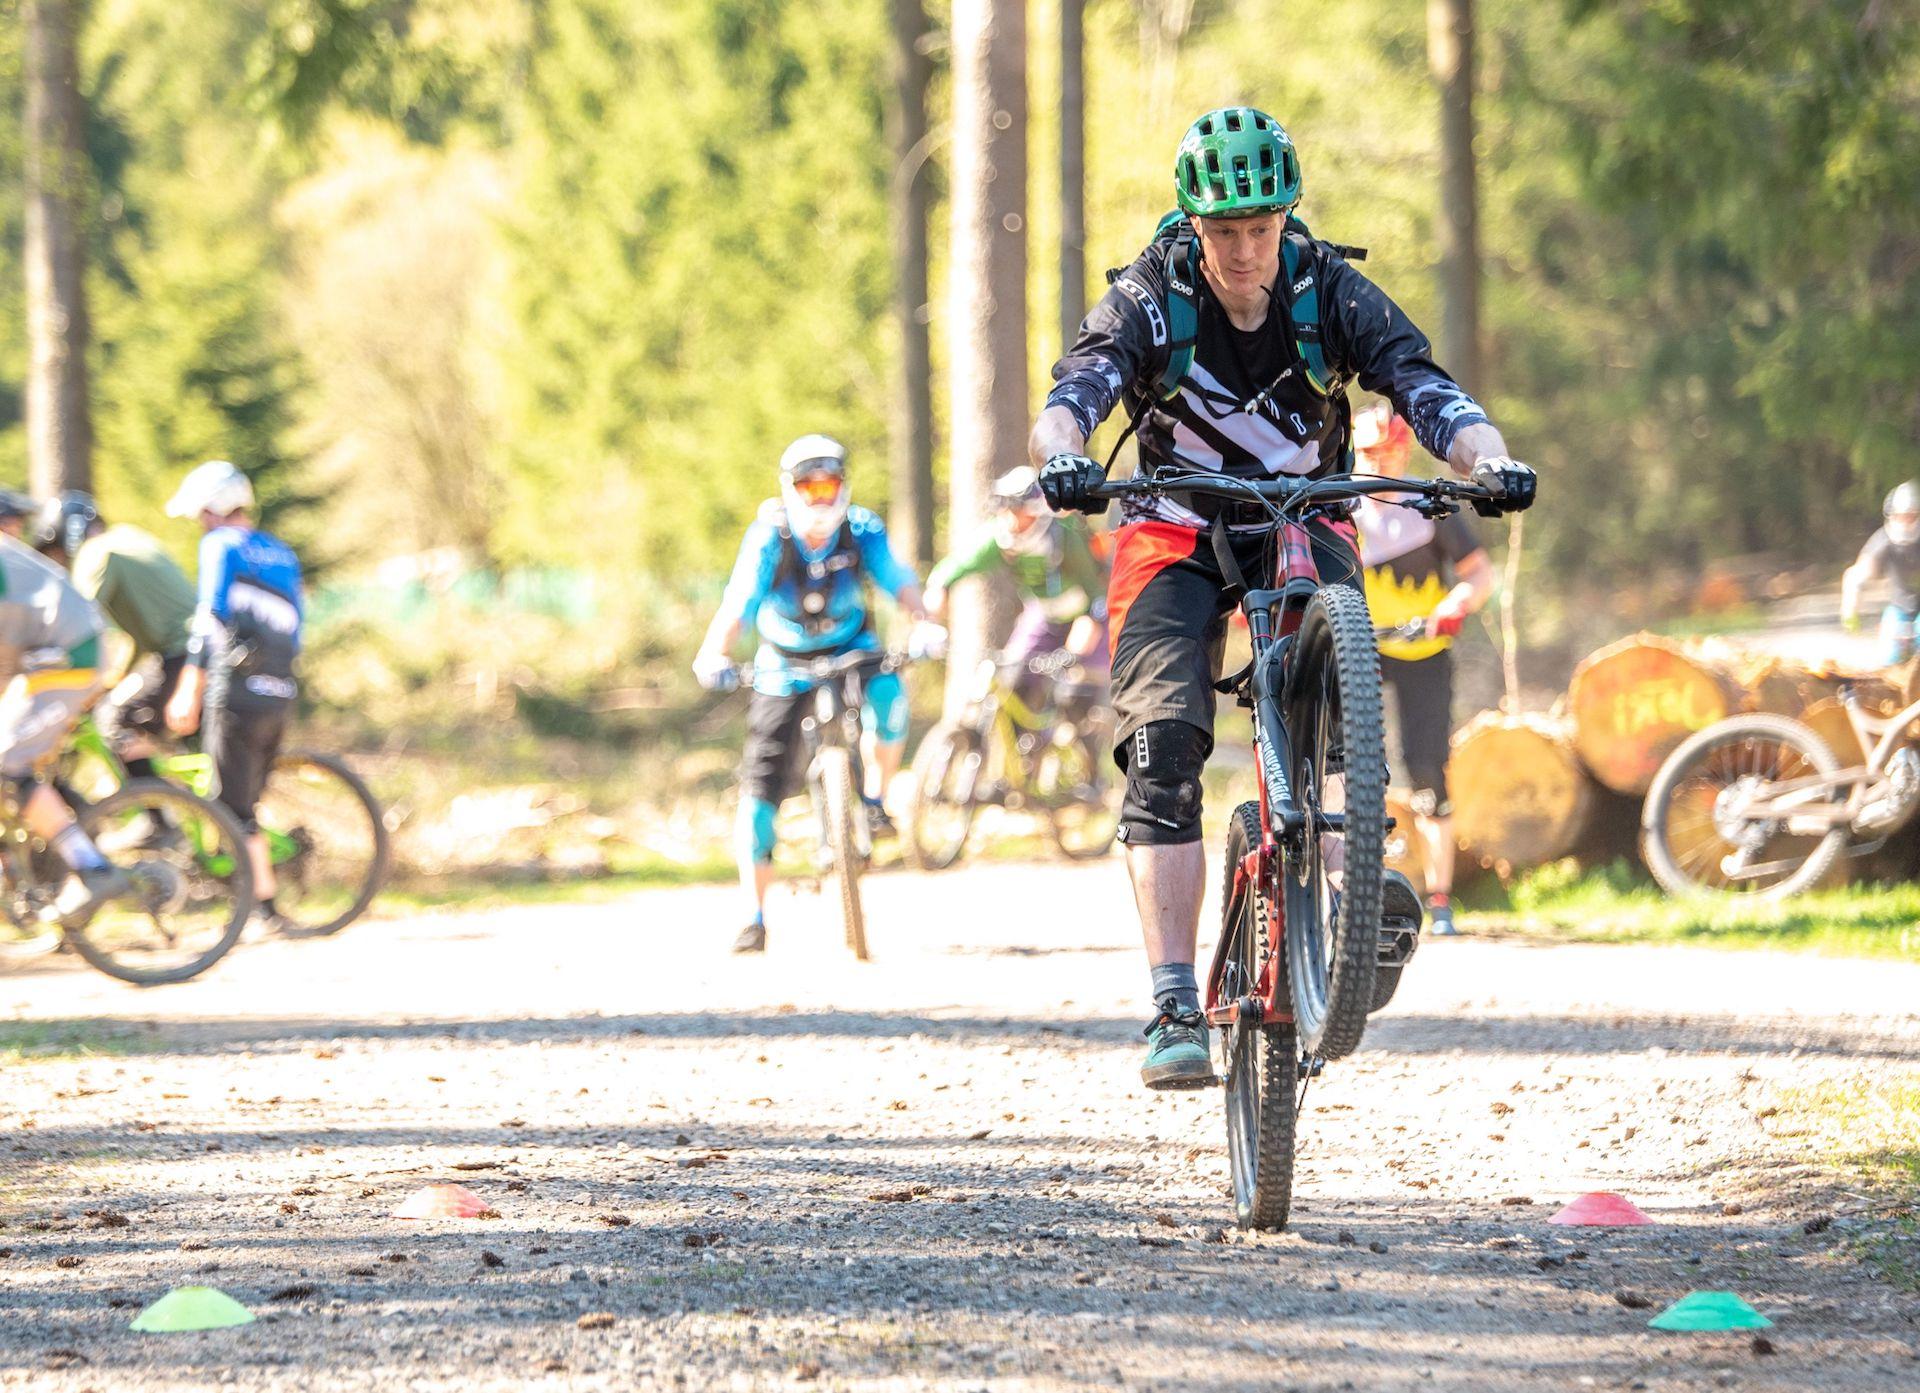 MTB Fahrtechnik Kurse Weiskirchen (Hochwald) Saarland Training Einsteiger Fortgeschritten Experten Kinder Rock my Trail Bikeschule